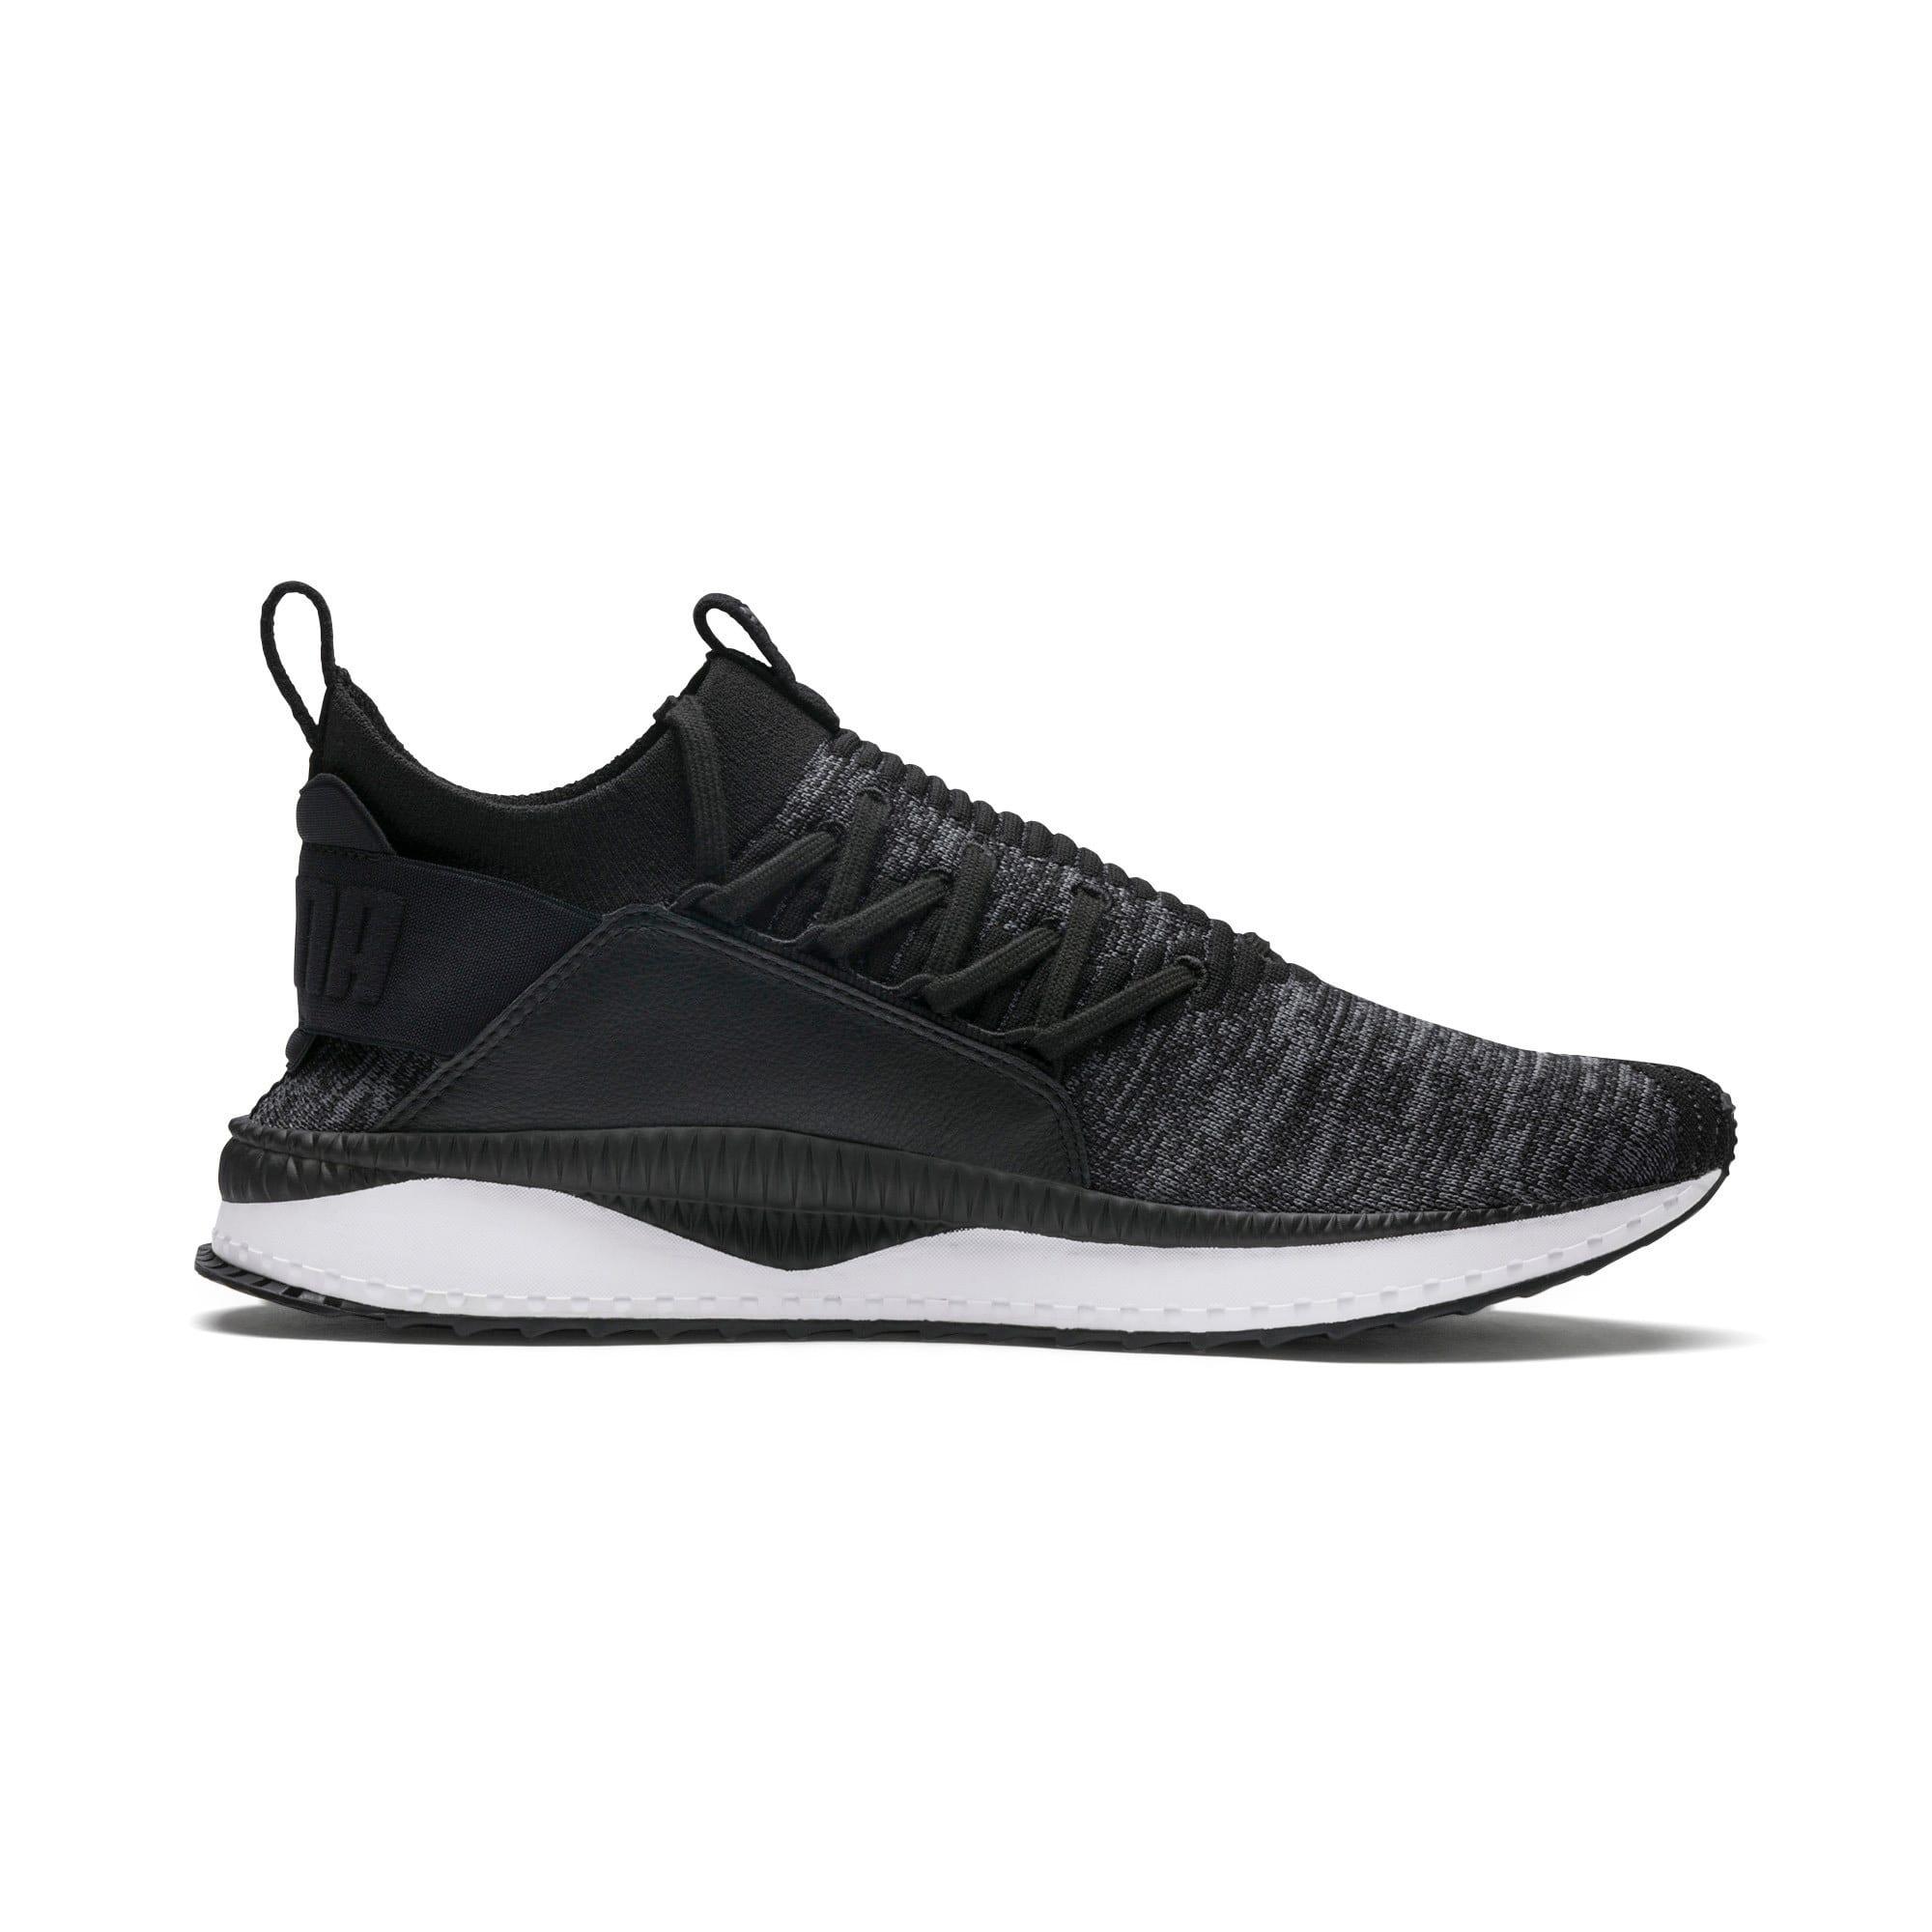 Thumbnail 5 of TSUGI JUN Escape Sneakers, Puma Black-Iron Gate, medium